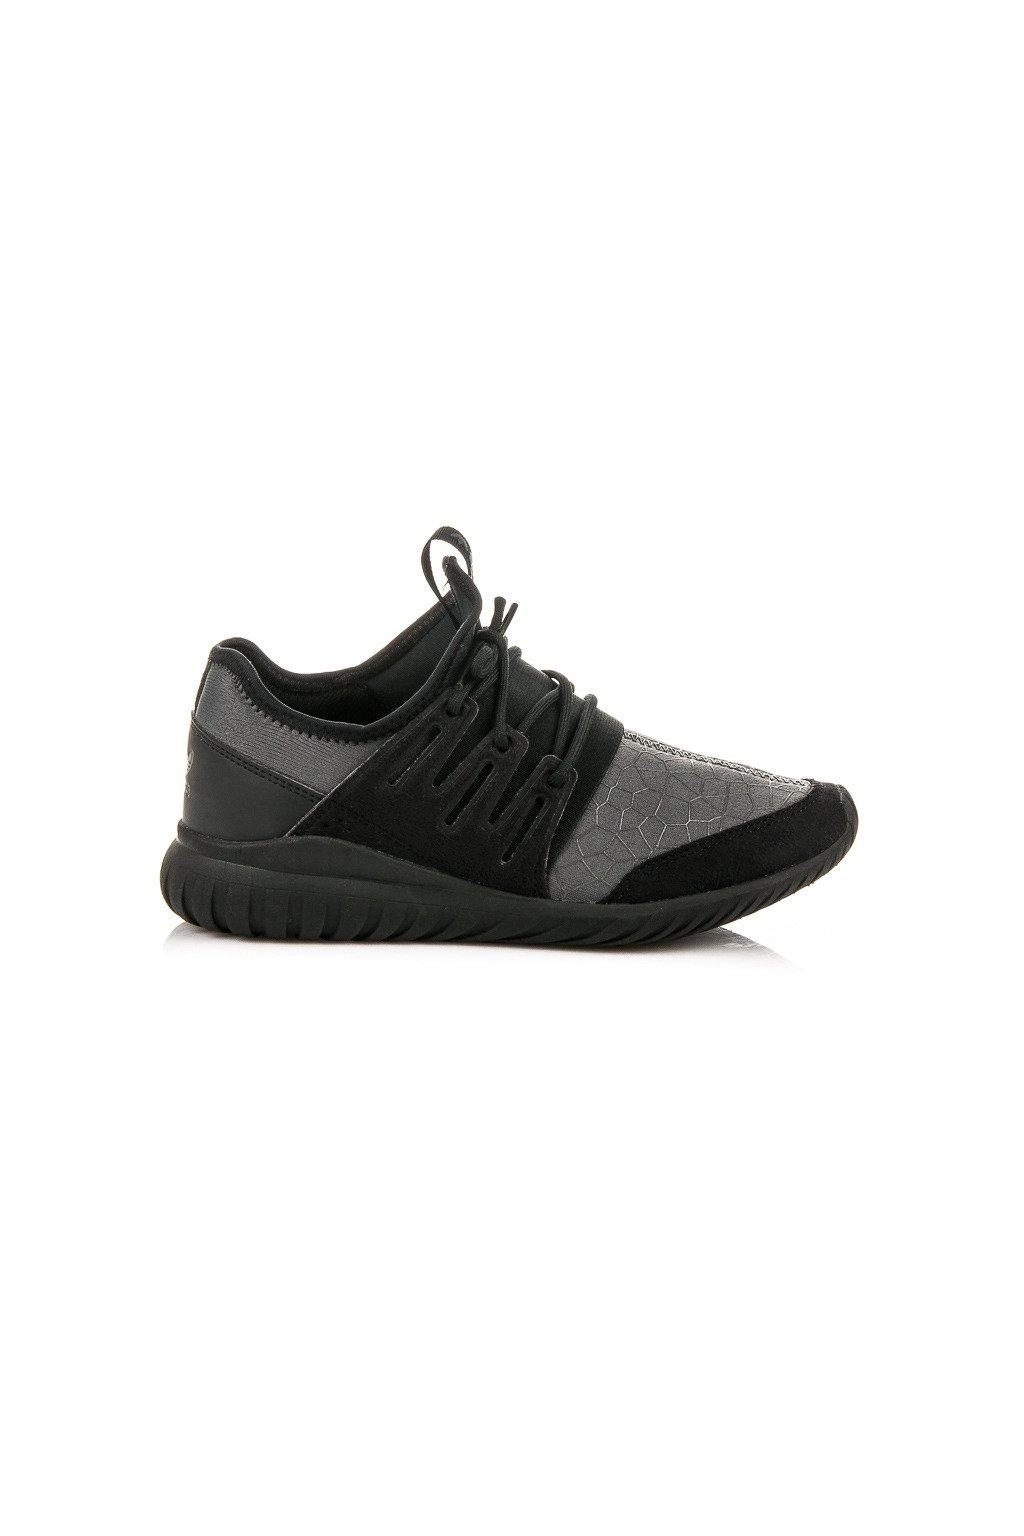 Čierne tenisky - Adidas kod S81919